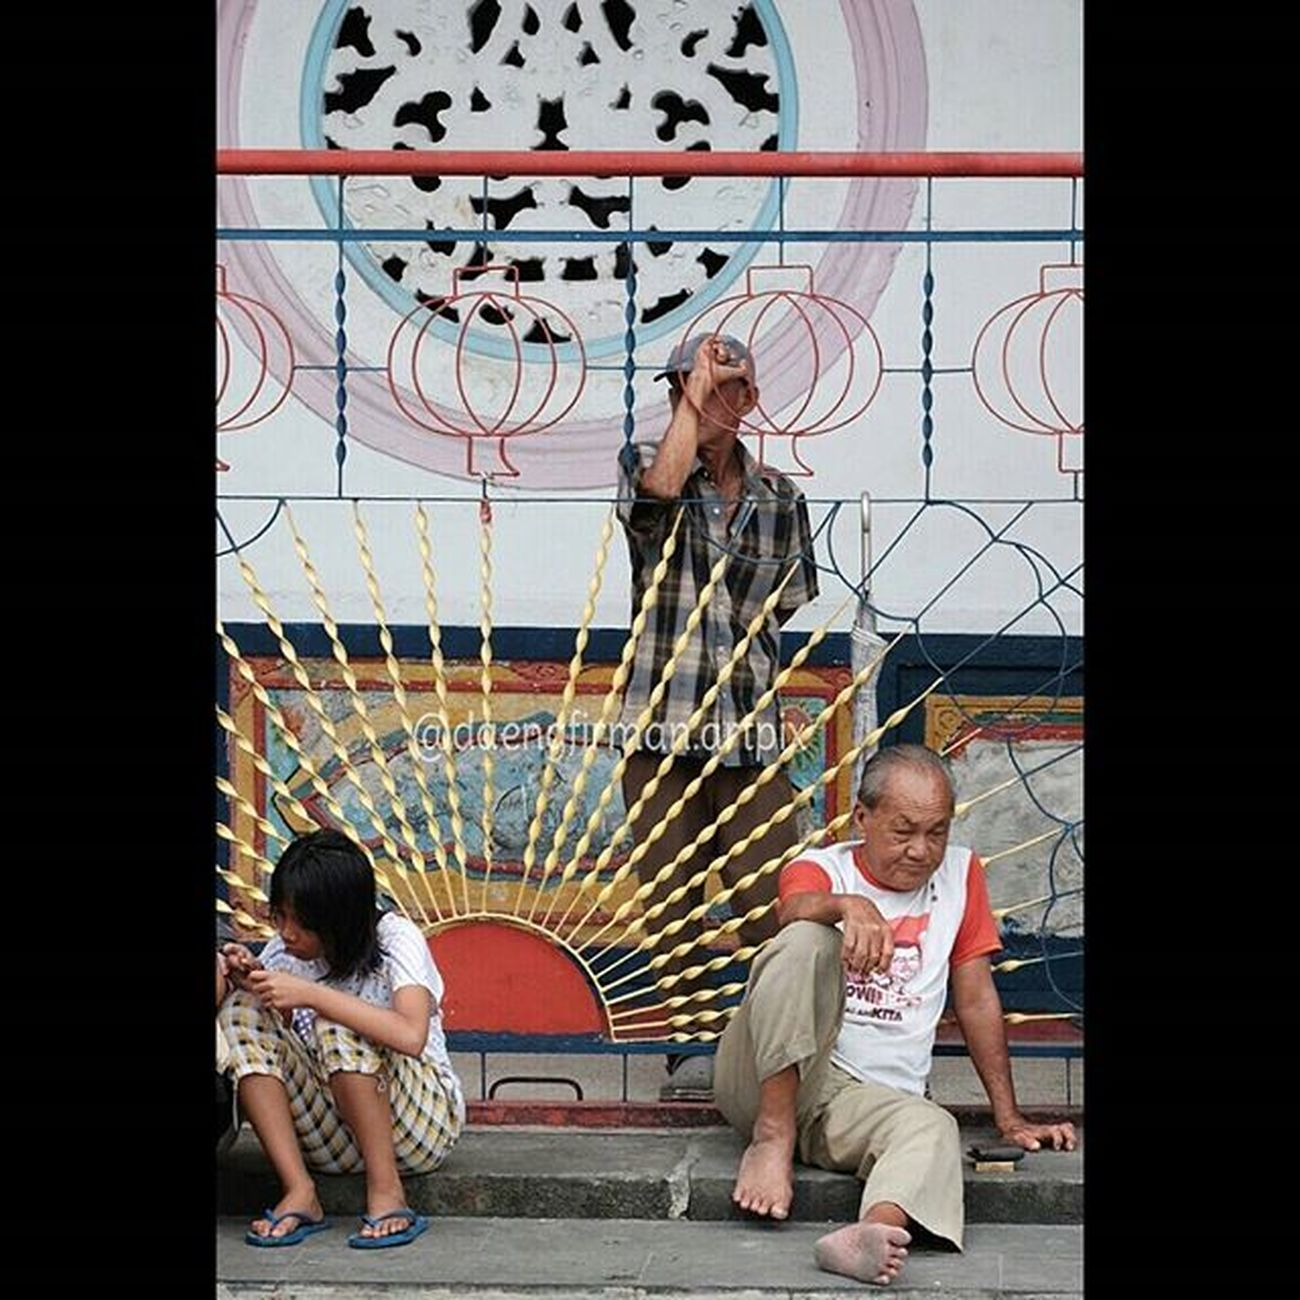 Streetlife in Dailylife at Bahtera Sasana chinese temple in Tanjungpinang city, this temple was a more than 200 year old. No PS Sooc and just crop ClassicChrome Film Simulation. Wonderfullkepri Indonesia_photography Pewartafotoindonesia Natgeonesia 1000kata KepriBukanRiau Serikat_fi IndonesiaOnly Geonusantara Kompasnusantara Lensaindonesia Photooftheday Thephotosociety Streetphotography Streetphotographers Mirrorlesscamera Xa2 Fujifilmxa2 Fujifilm_xseries Gofujifilm Fujifilm_id Showofffujifilm terFUJIlah Xphotographer FujiFeed HIPAae HIPAsnap